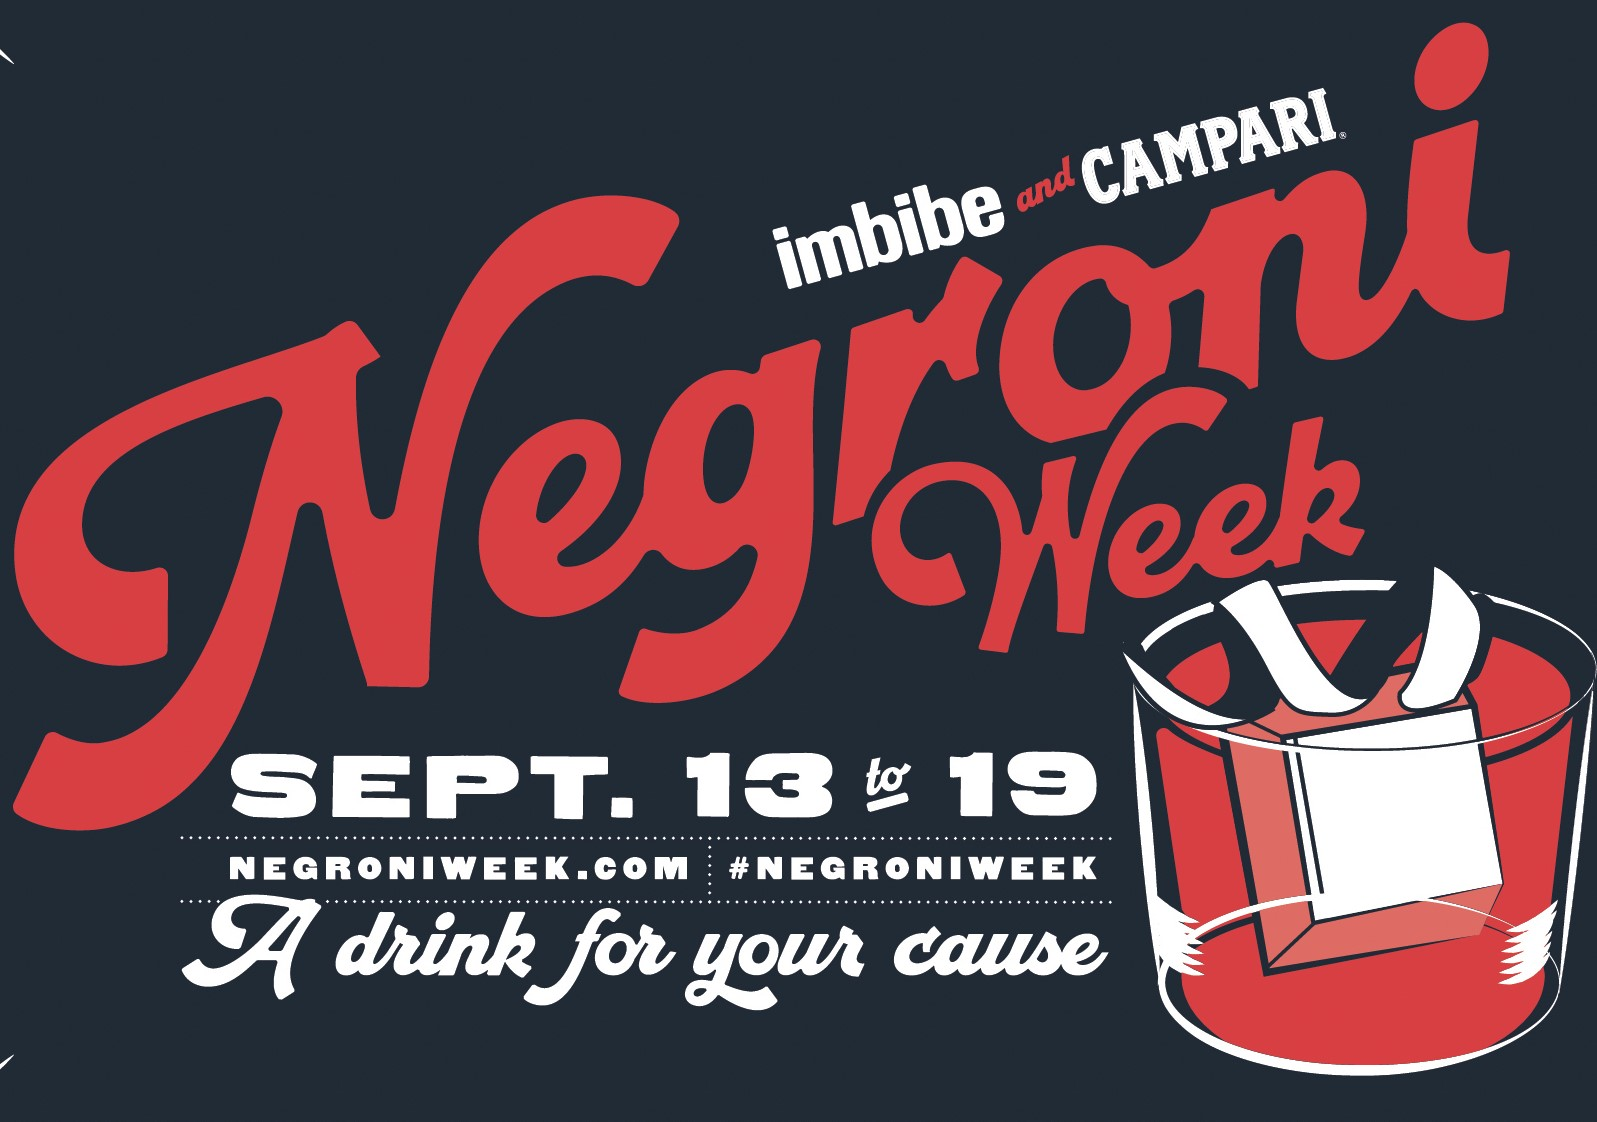 Negroni Week September 2021 Dates Announced